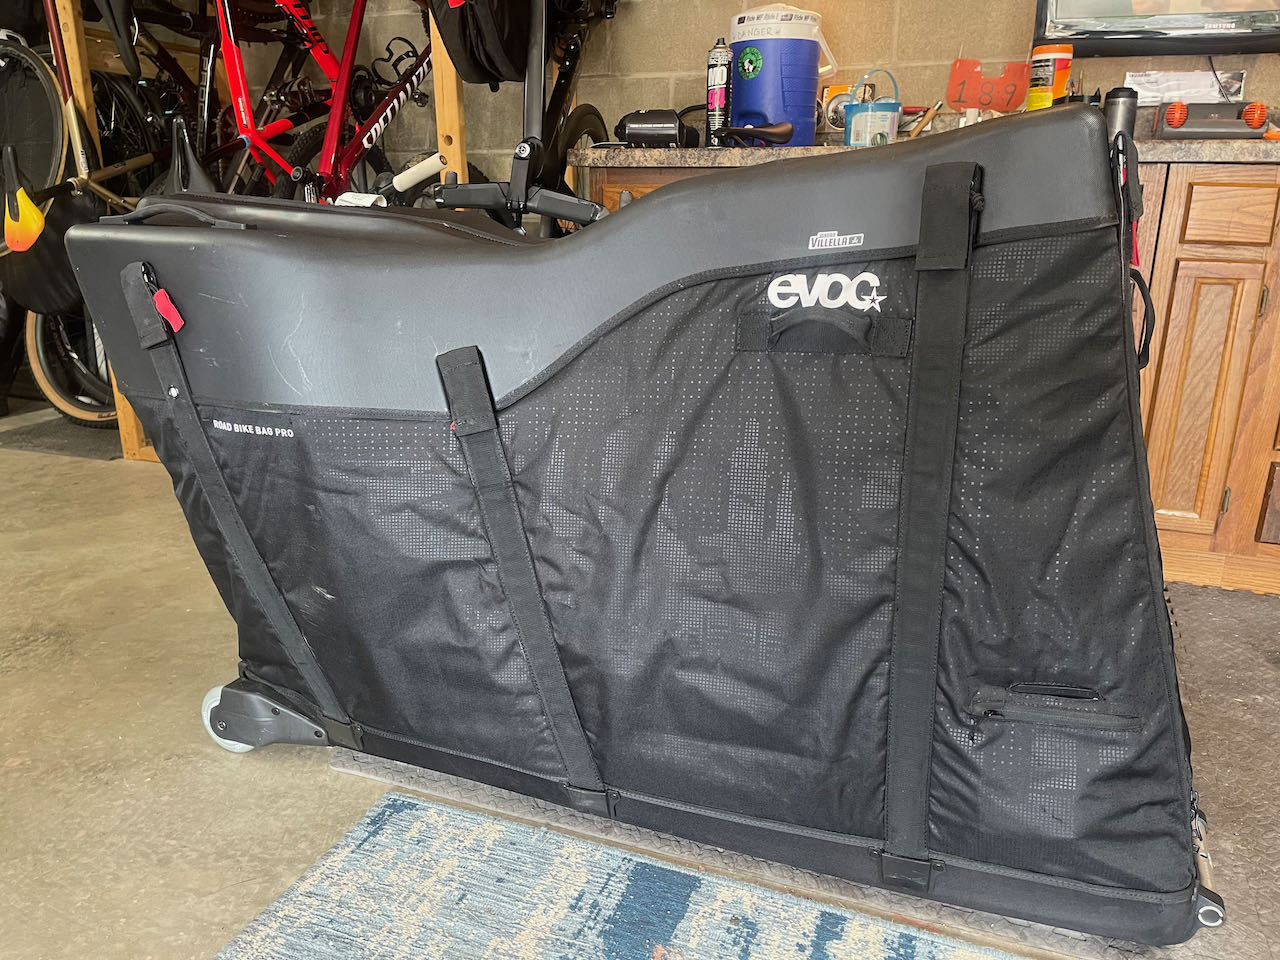 EVOCs Road Bike Bag Pro Ready to roll